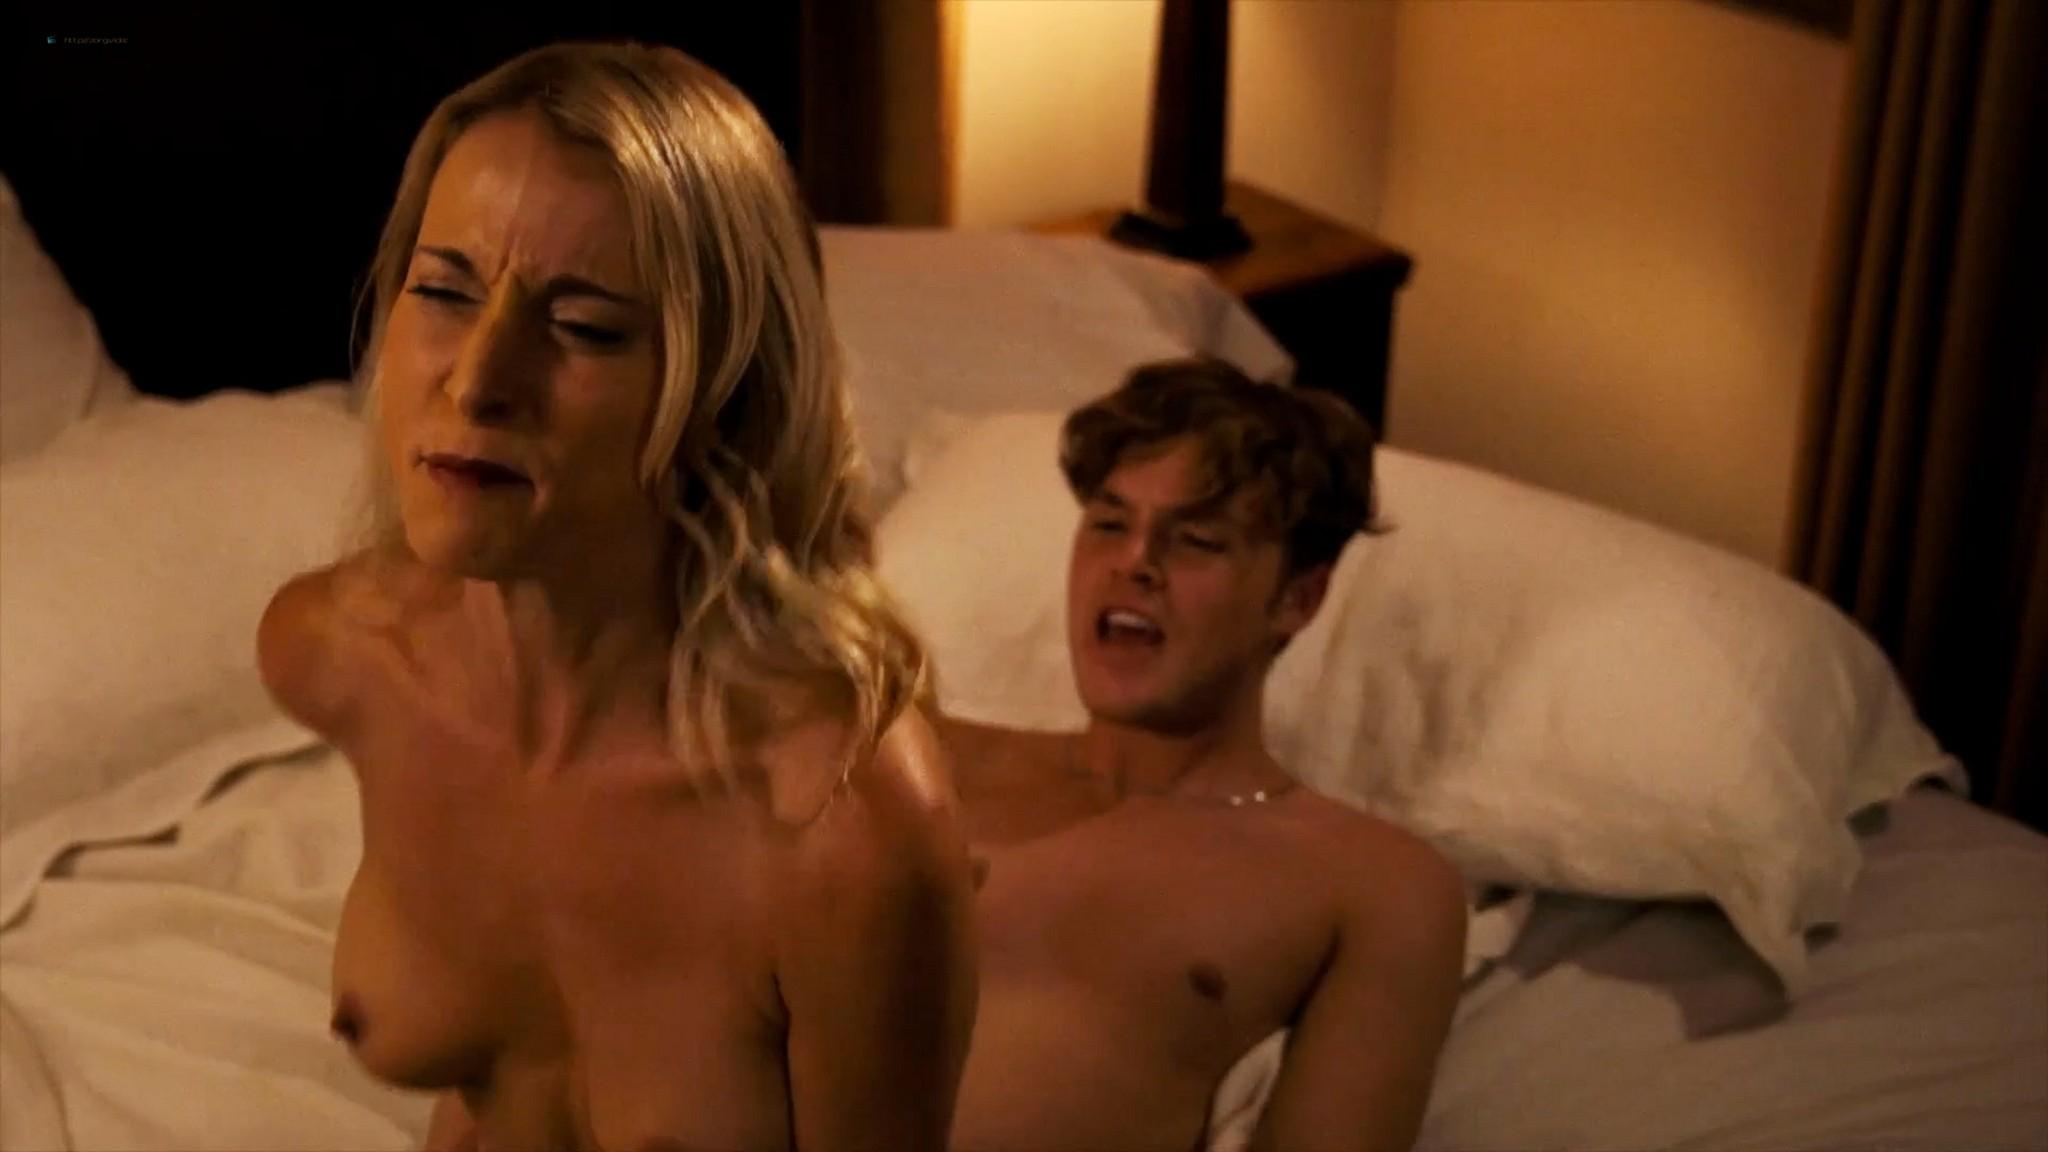 Sadie Katz nude lesbian sex with Victoria De Mare - Hanukkah (2019) HD 1080p Web (10)